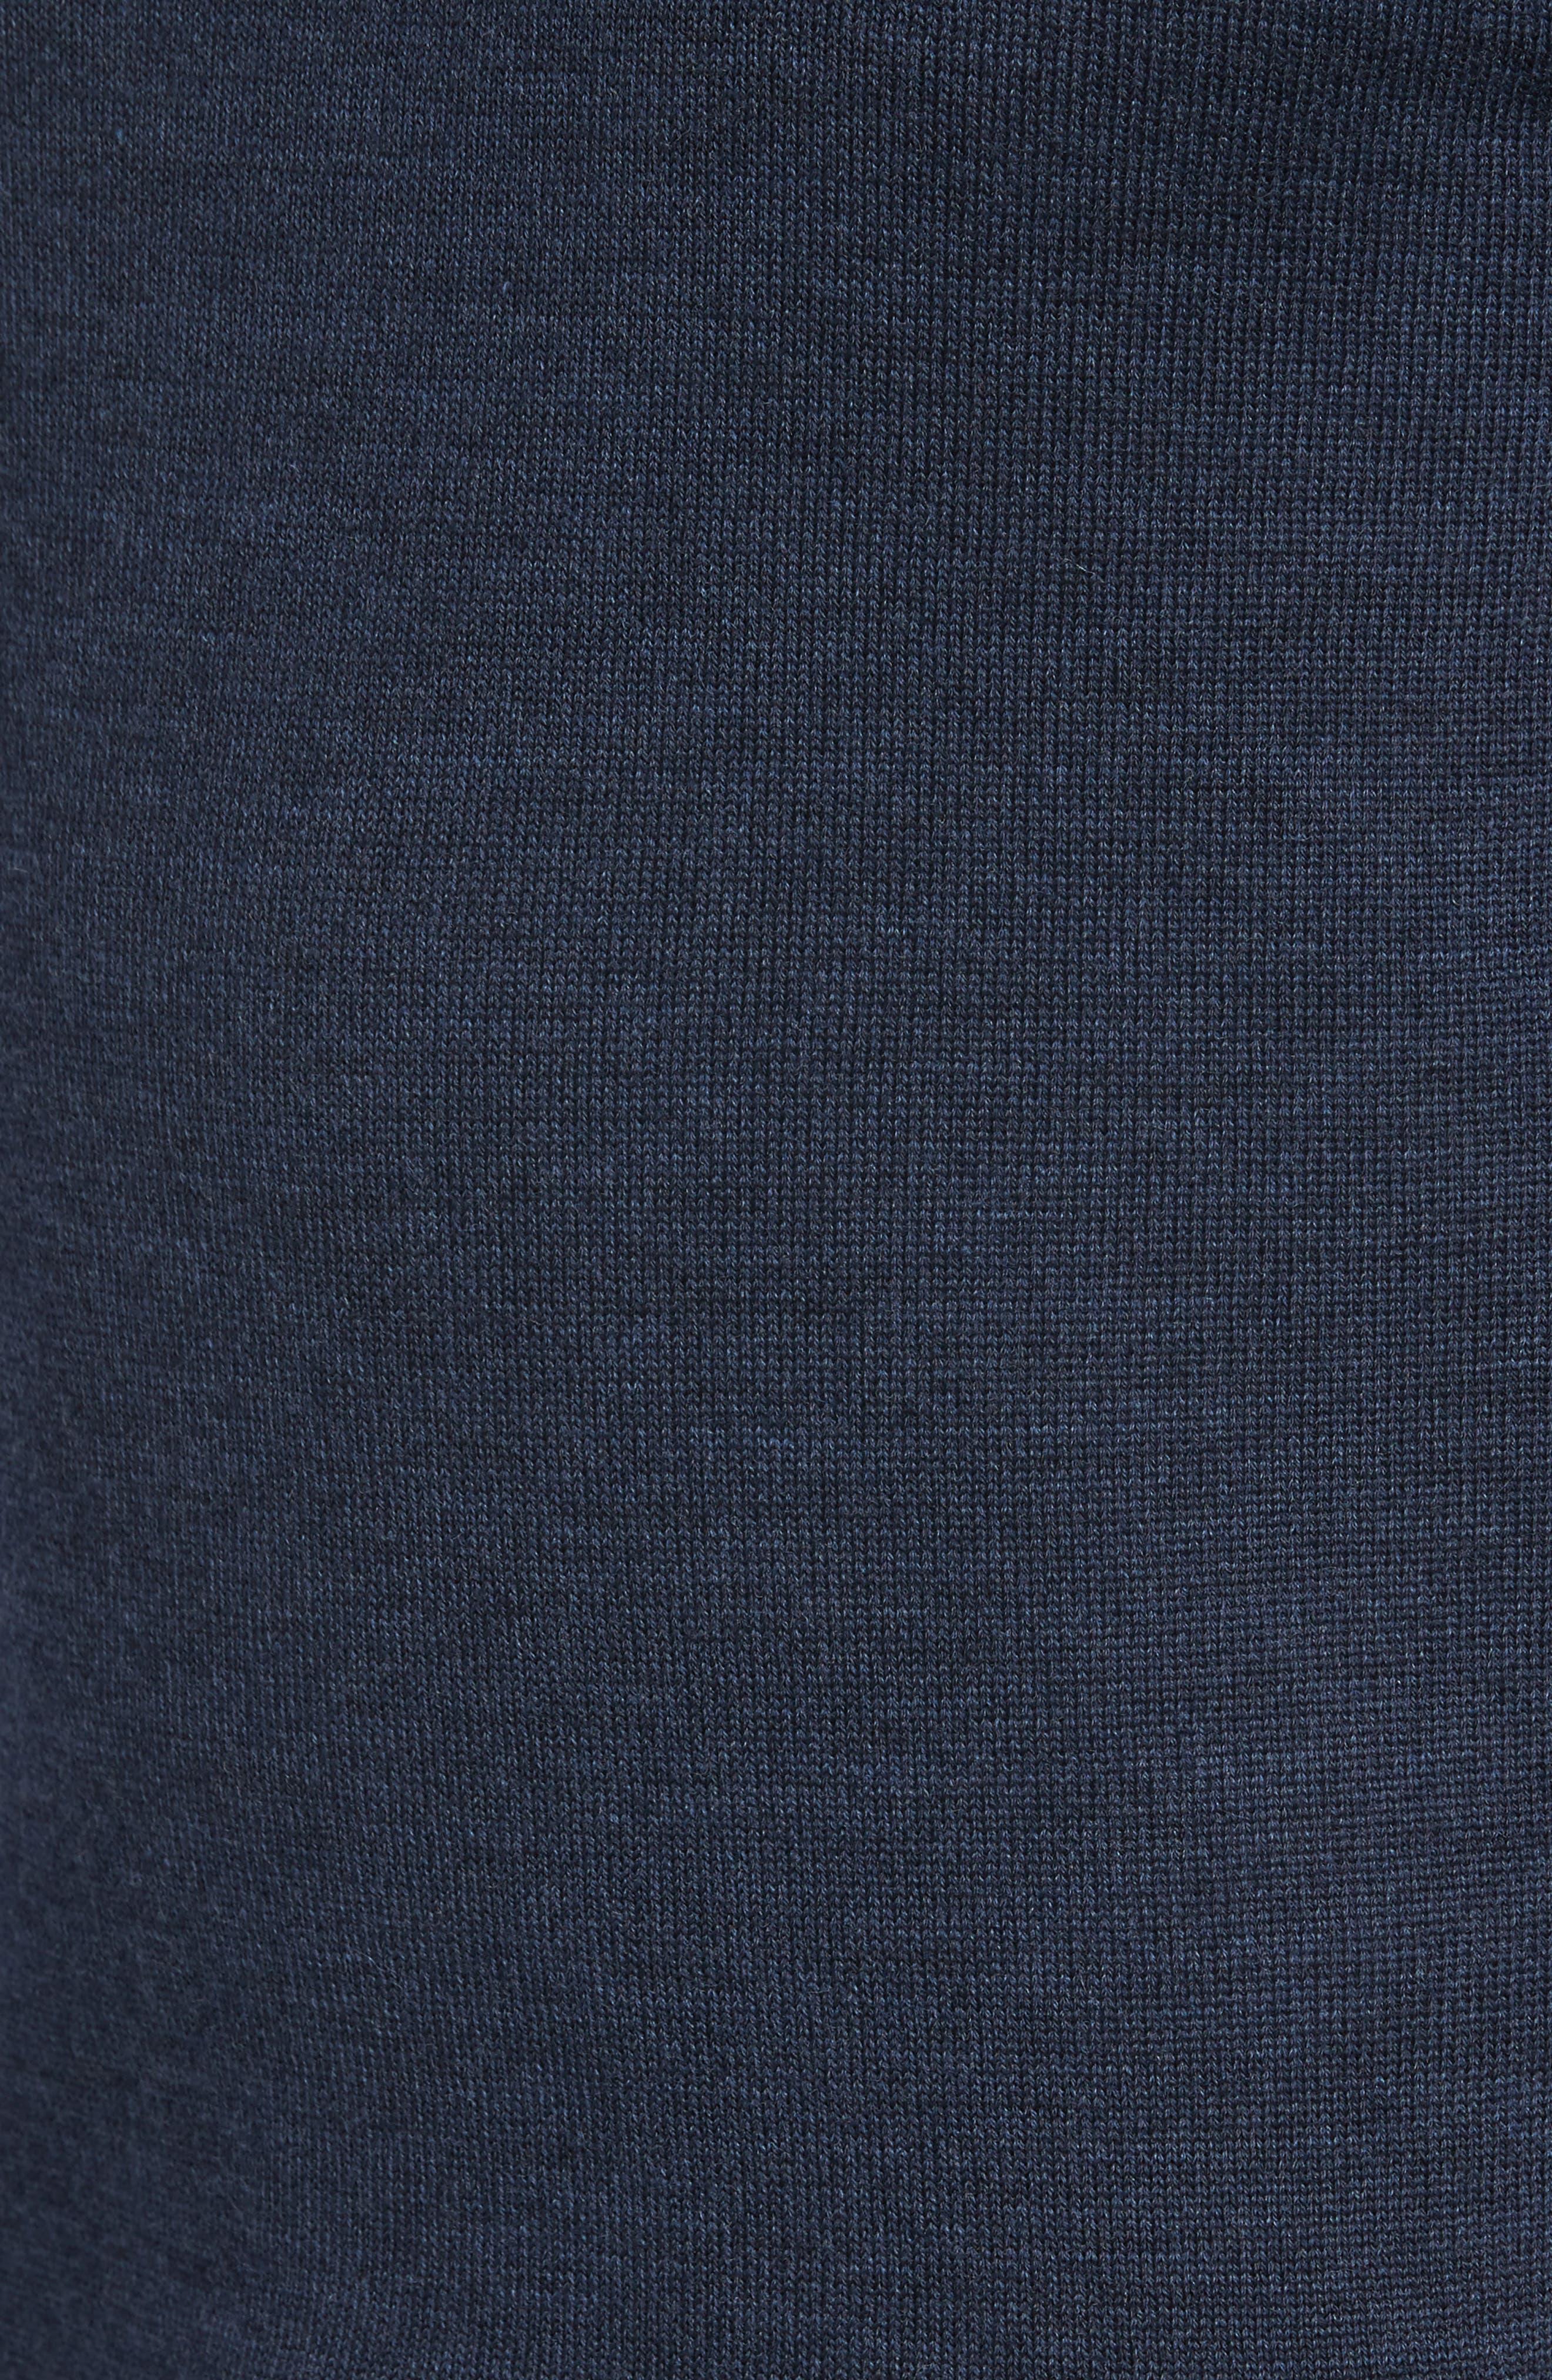 Bannockburn Mélange Merino Wool Sweater,                             Alternate thumbnail 5, color,                             401